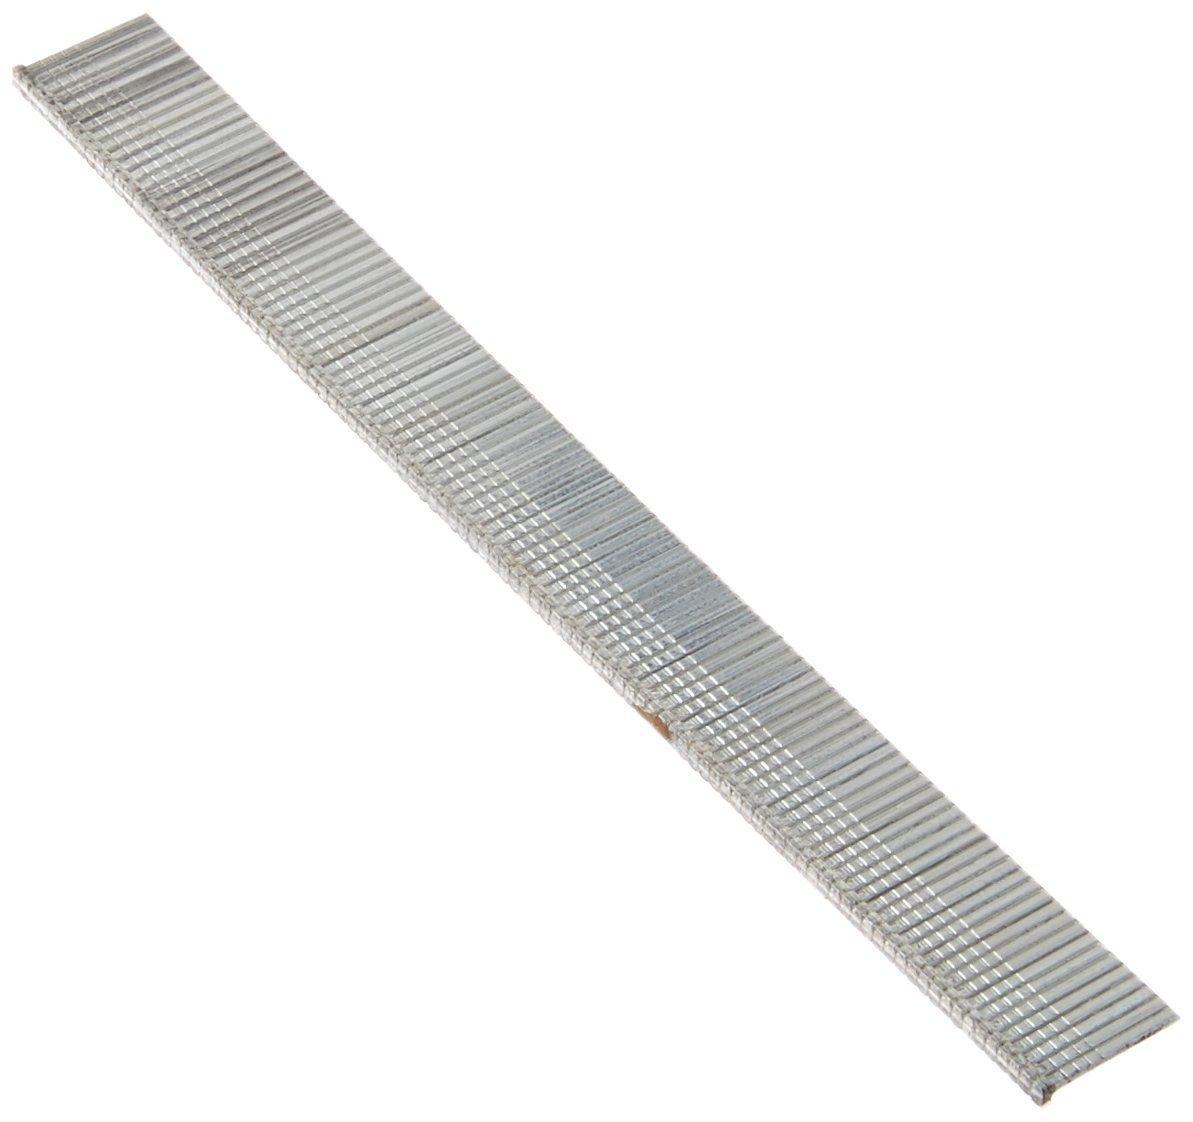 Stanley SWKBN050 1 000 Units 1 2 Inch Brad Nails